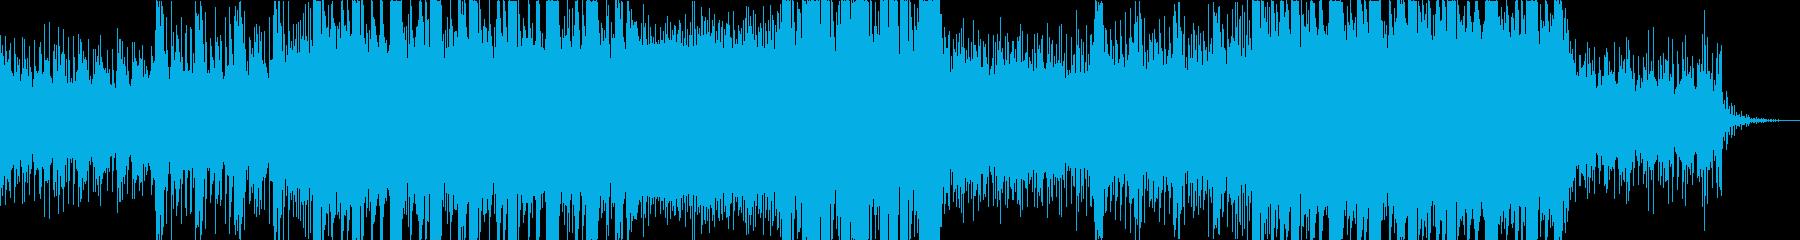 Apocalypse / Dubstepの再生済みの波形